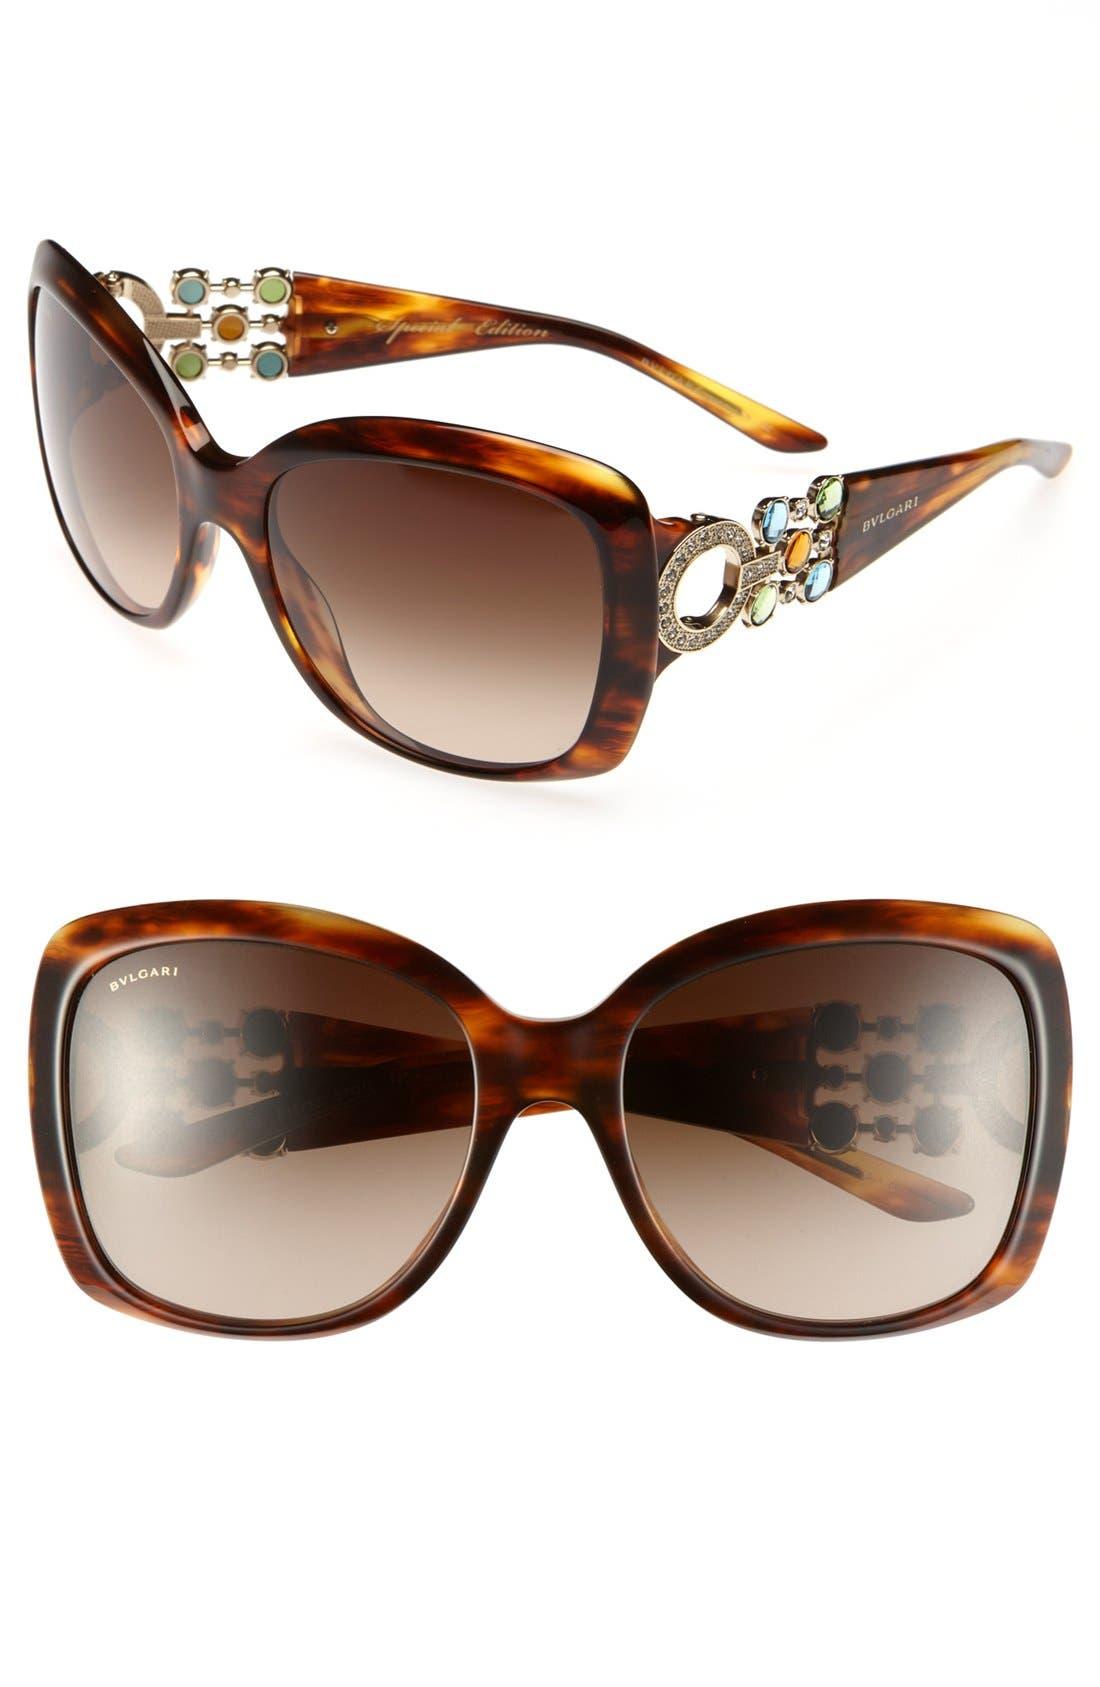 Main Image - BVLGARI 57mm Embellished Temple Sunglasses